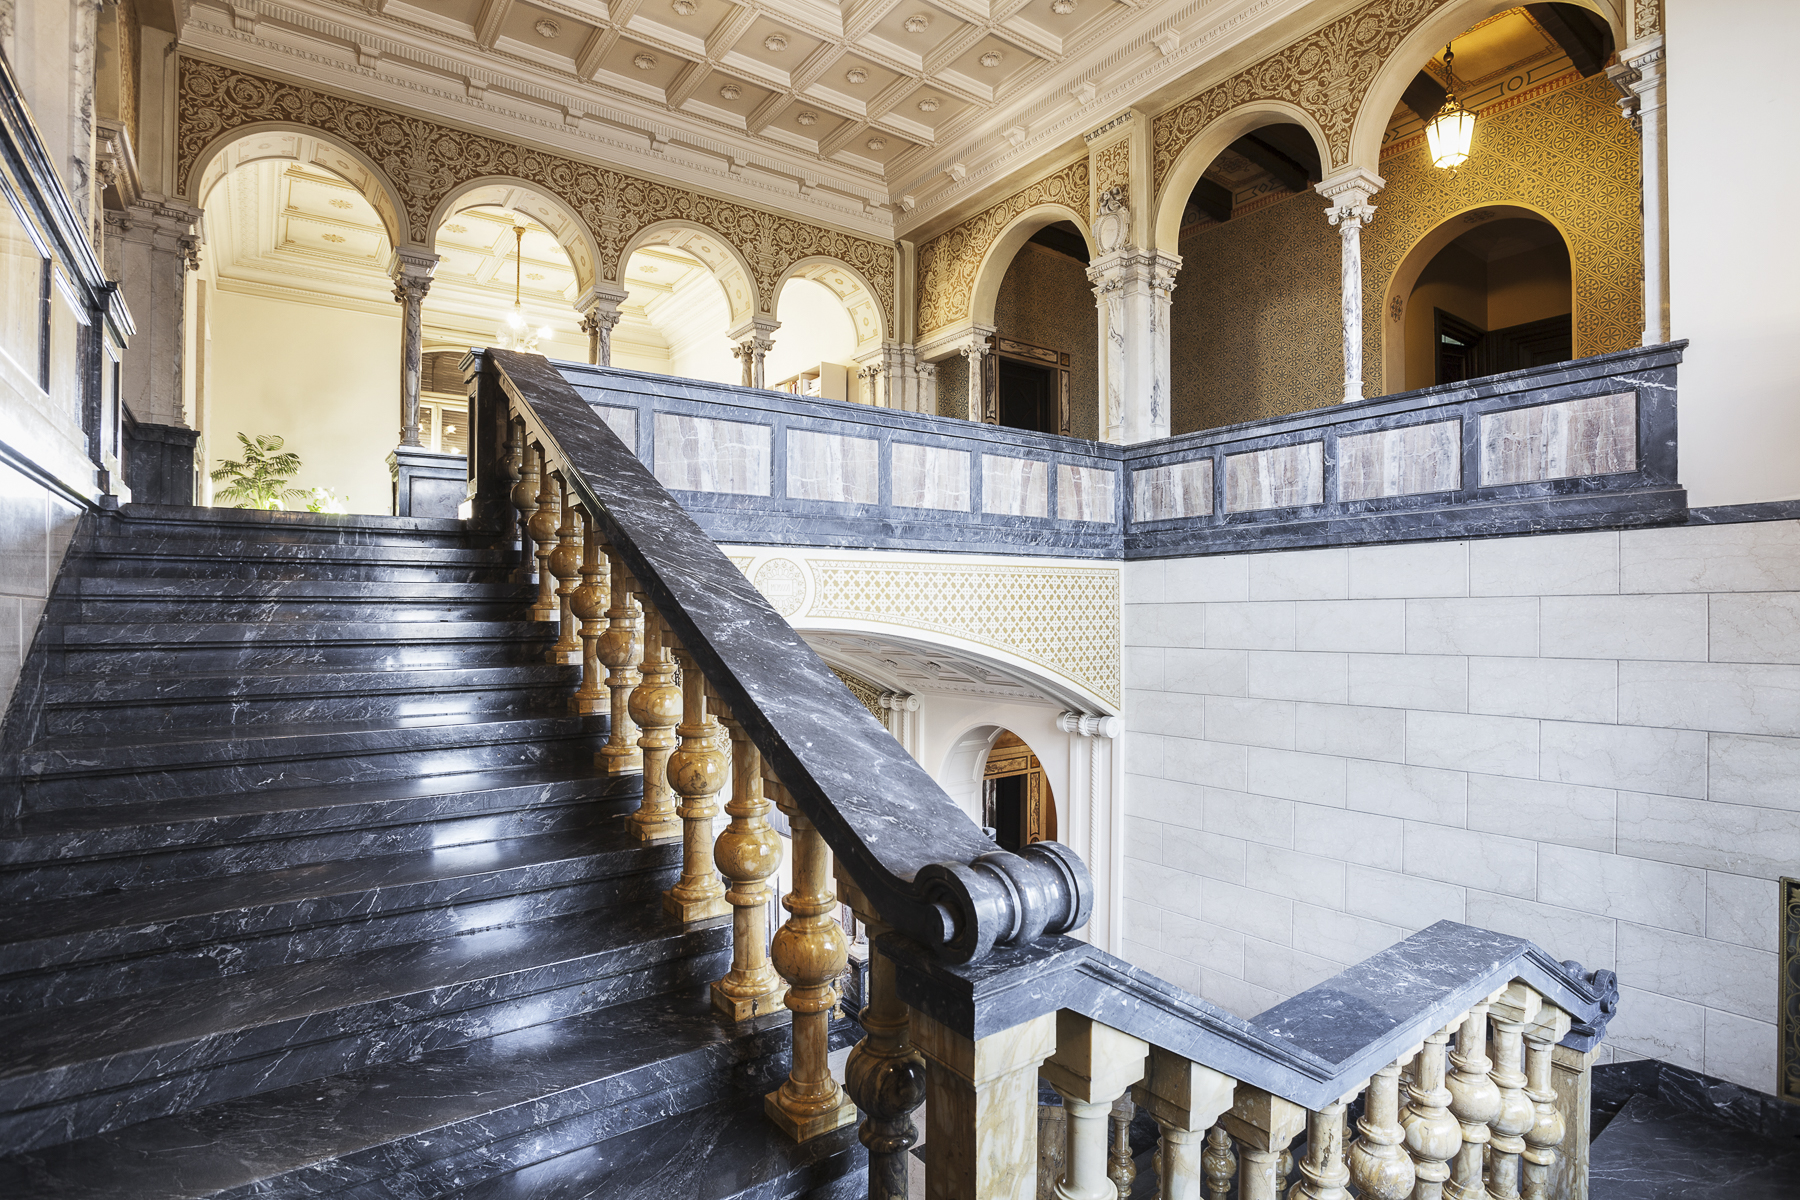 Maison unifamiliale pour l Vente à Beau Villa en style Liberty Via Galileo Galilei, 45 Biella, Biella 15900 Italie